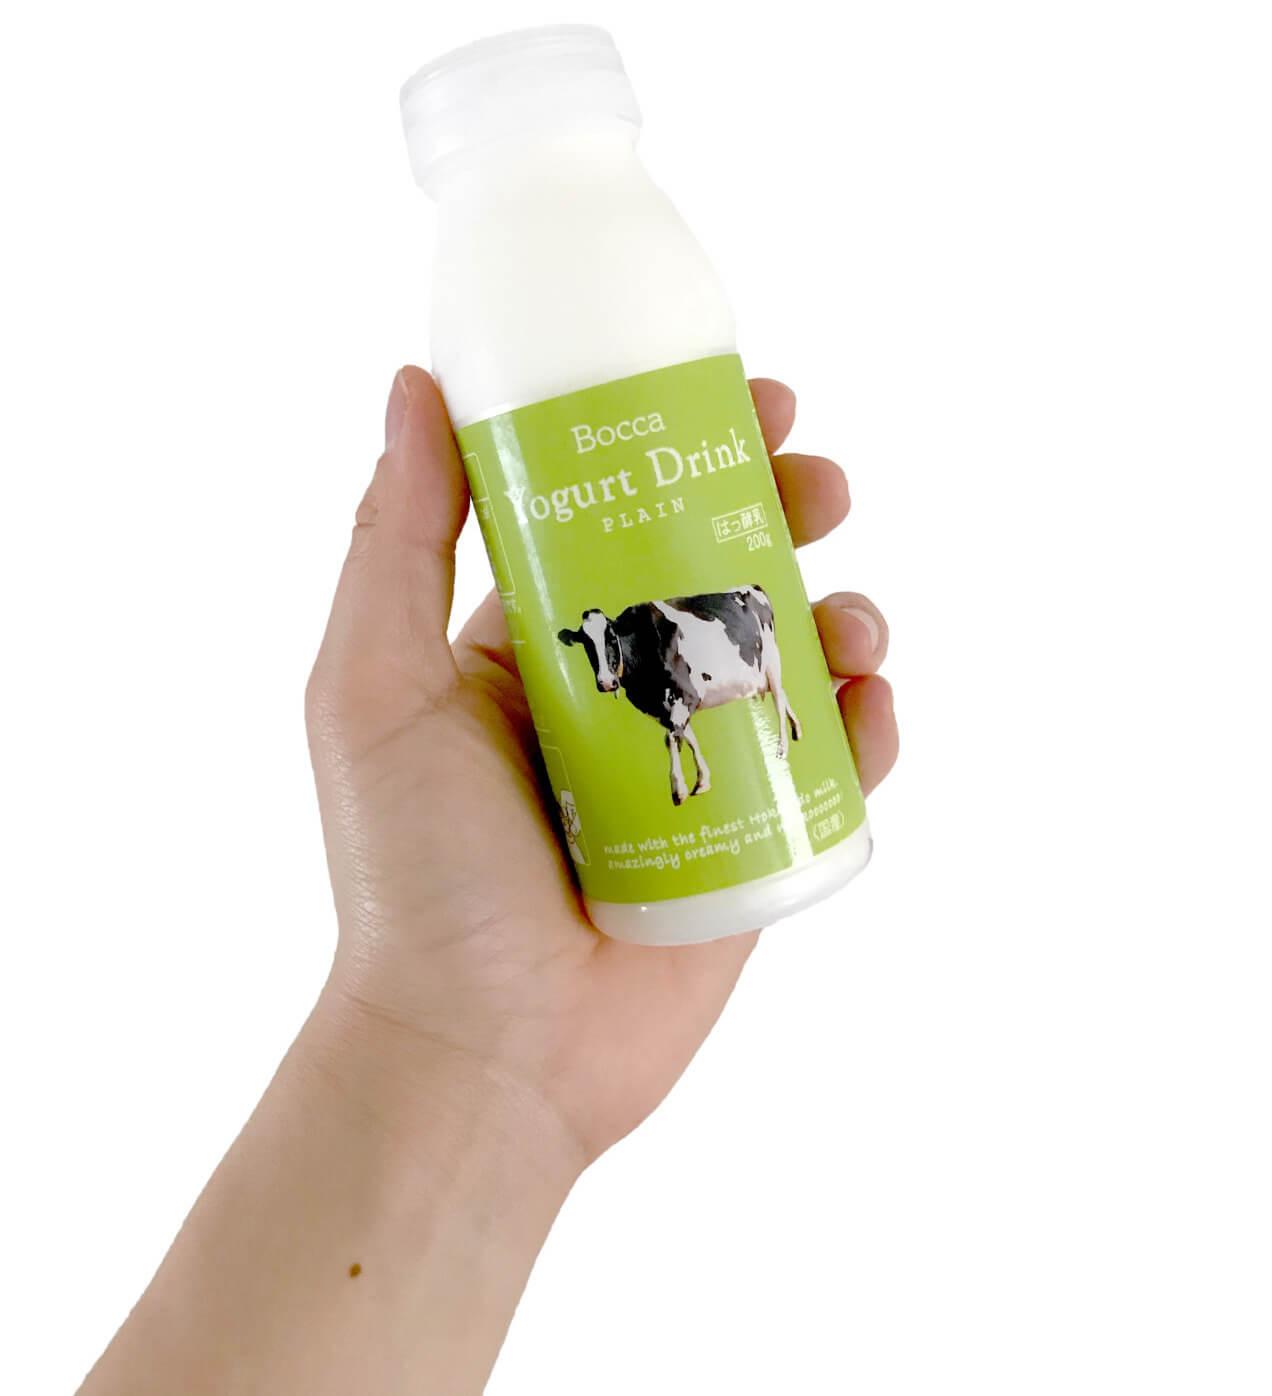 Bocca Yogurt Drink PLAIN